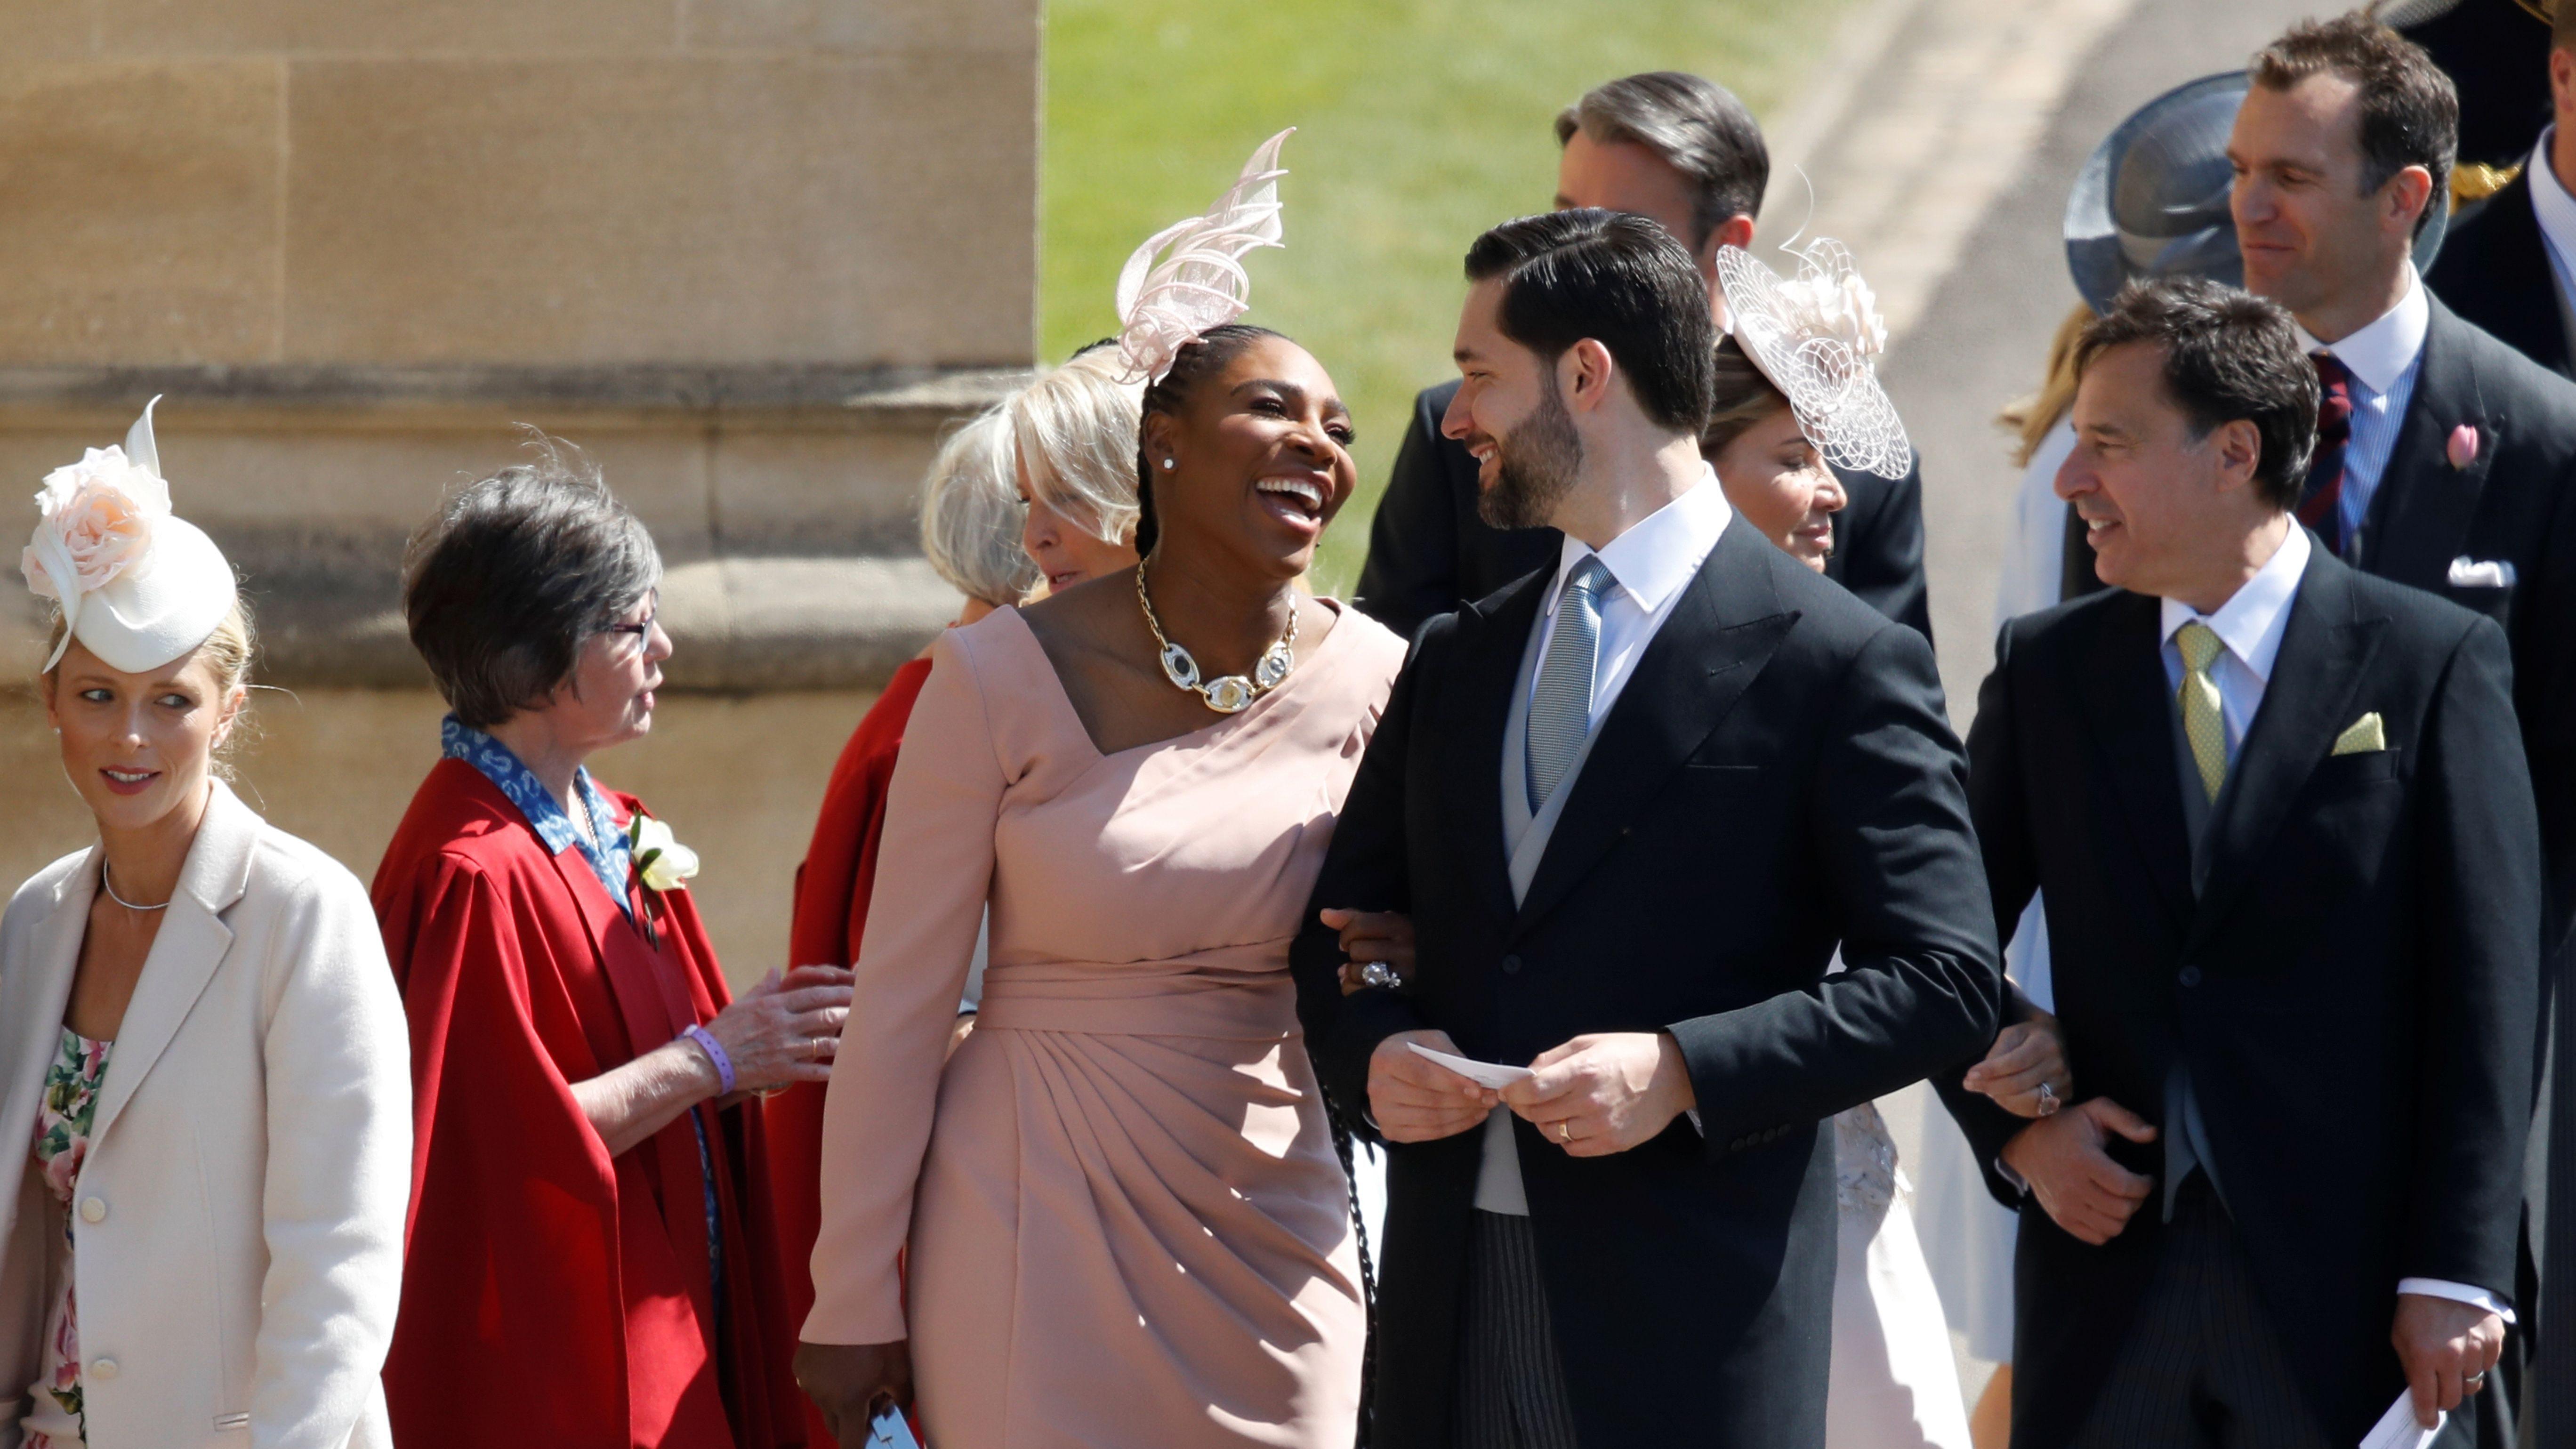 britain s royal wedding serena williams wore sneakers as formalwear quartz serena williams wore sneakers as